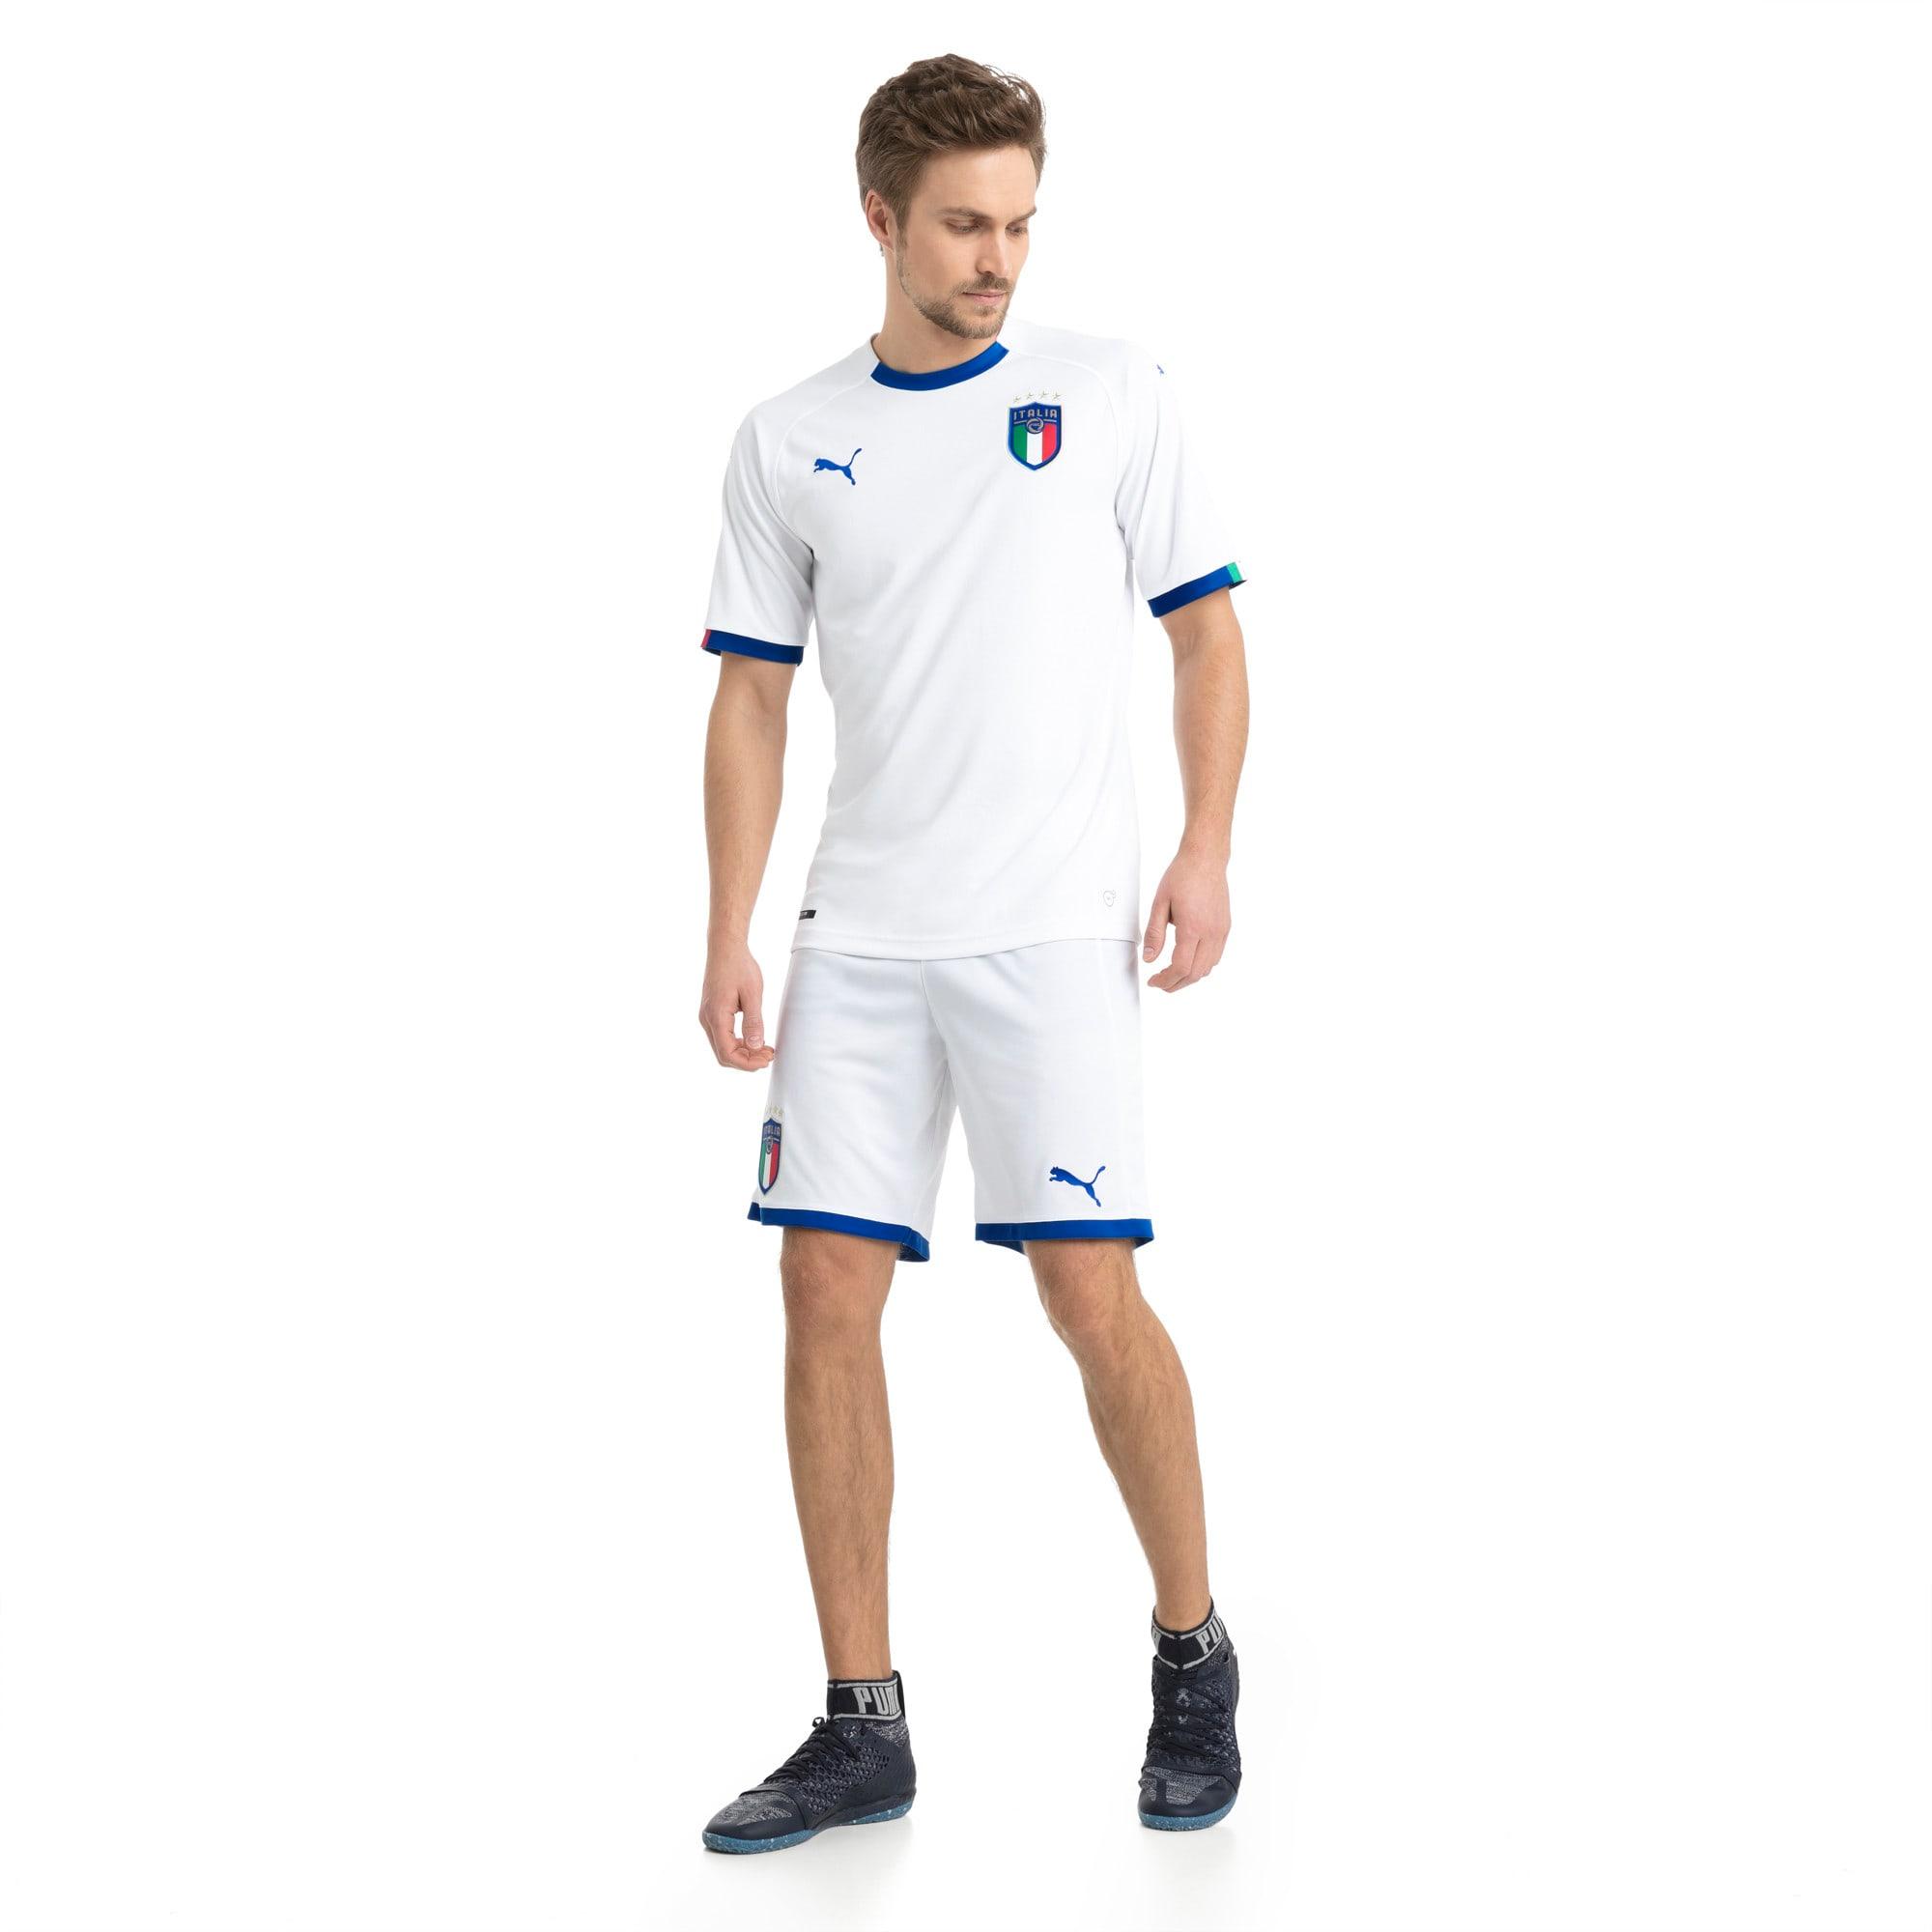 Thumbnail 3 of Italia Replica Shorts, Puma White, medium